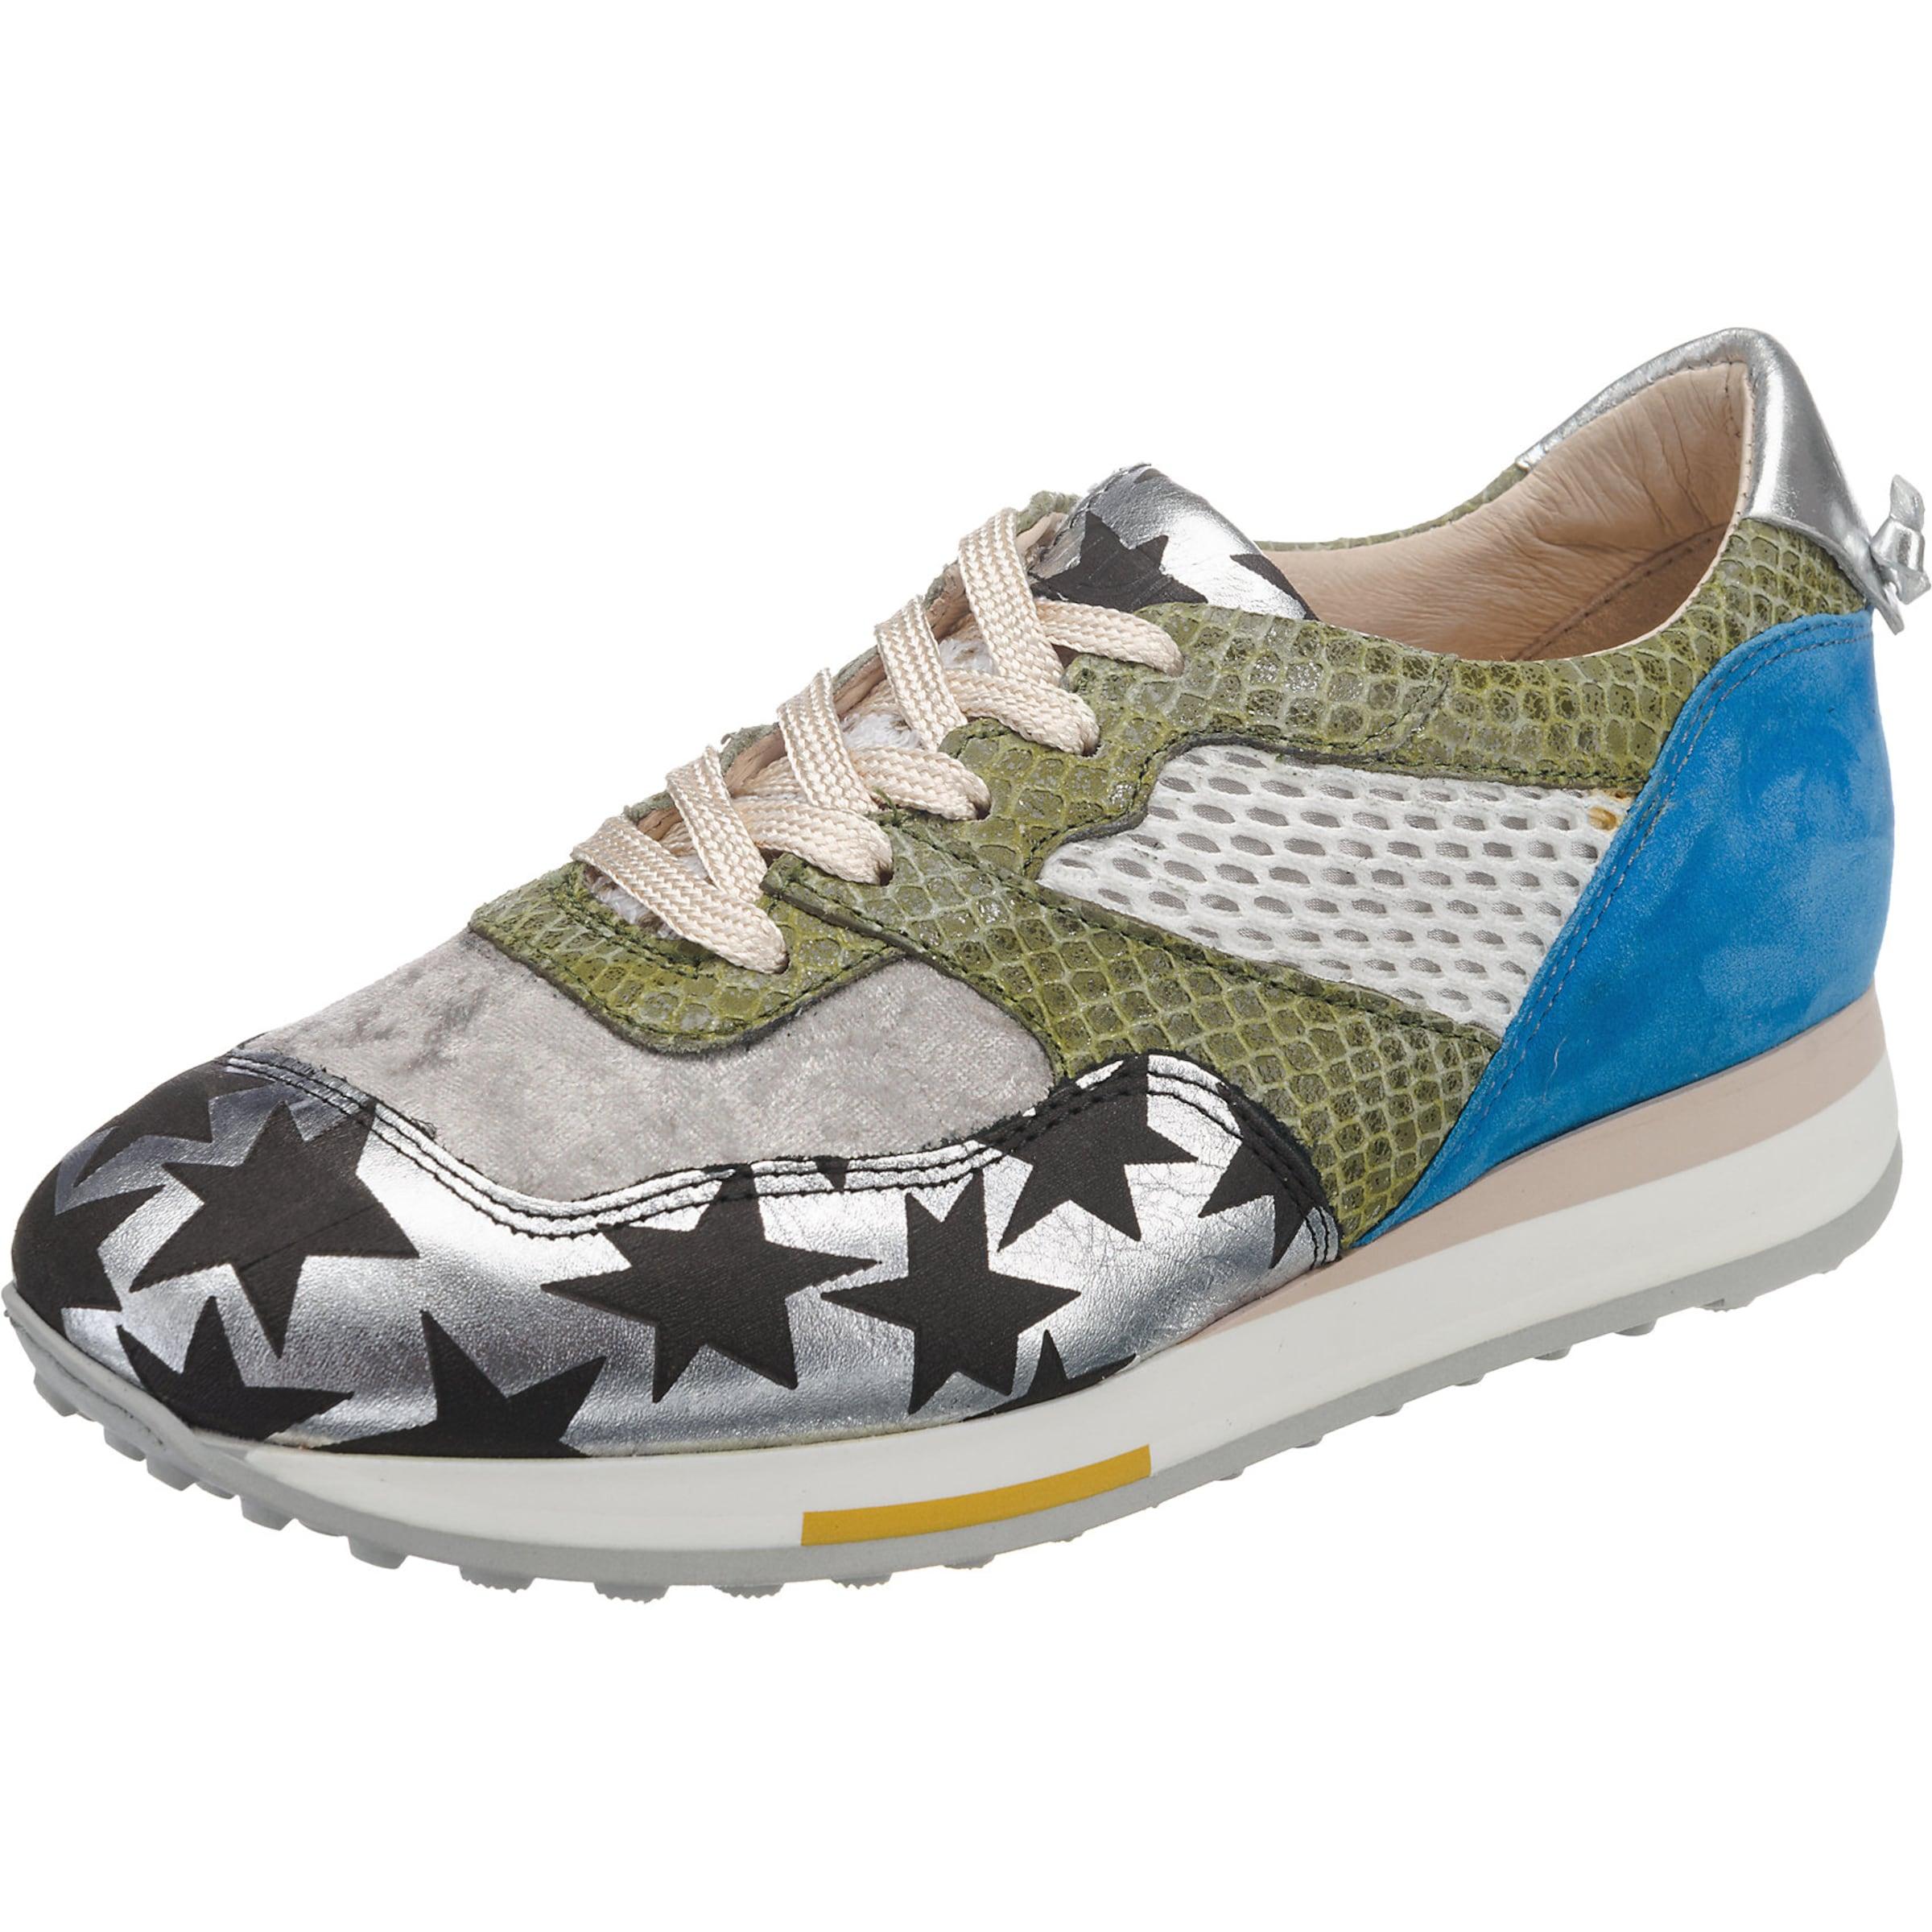 Haltbare Mode billige Schuhe MJUS | Trelly Sneakers Low Schuhe Gut getragene Schuhe